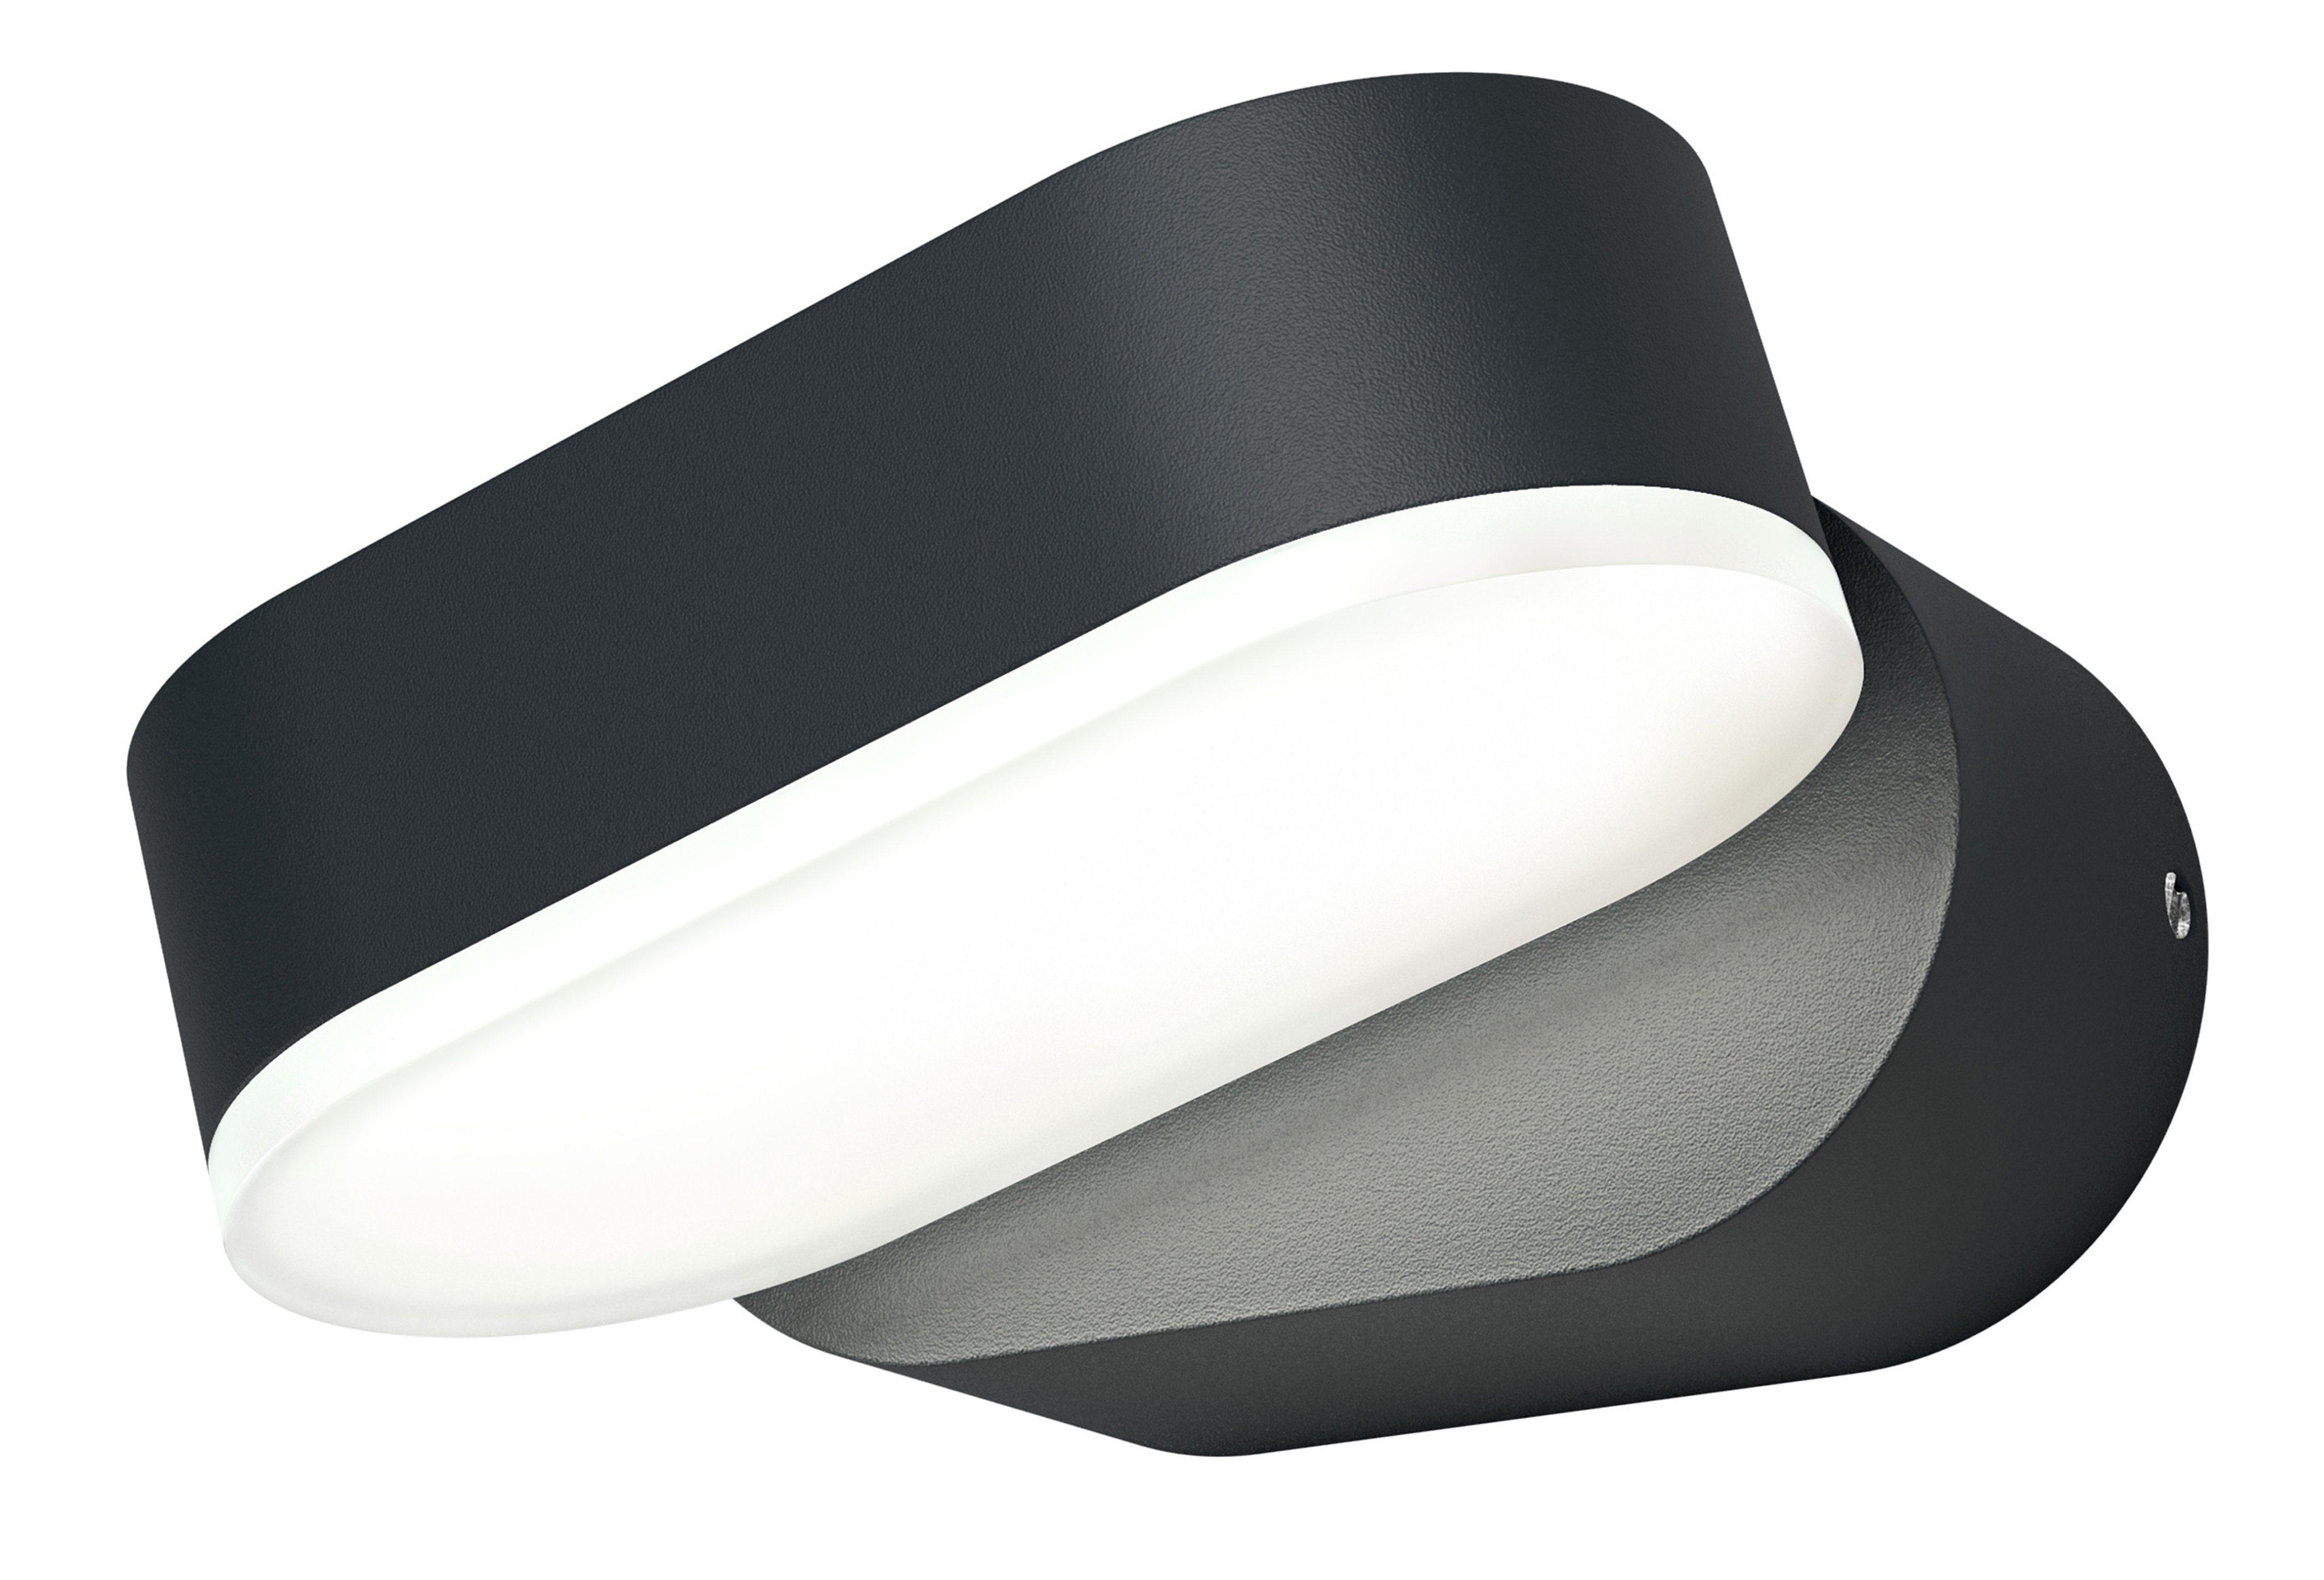 Retrofit Led Lampen : Osram led lampen led beleuchtung online kaufen otto